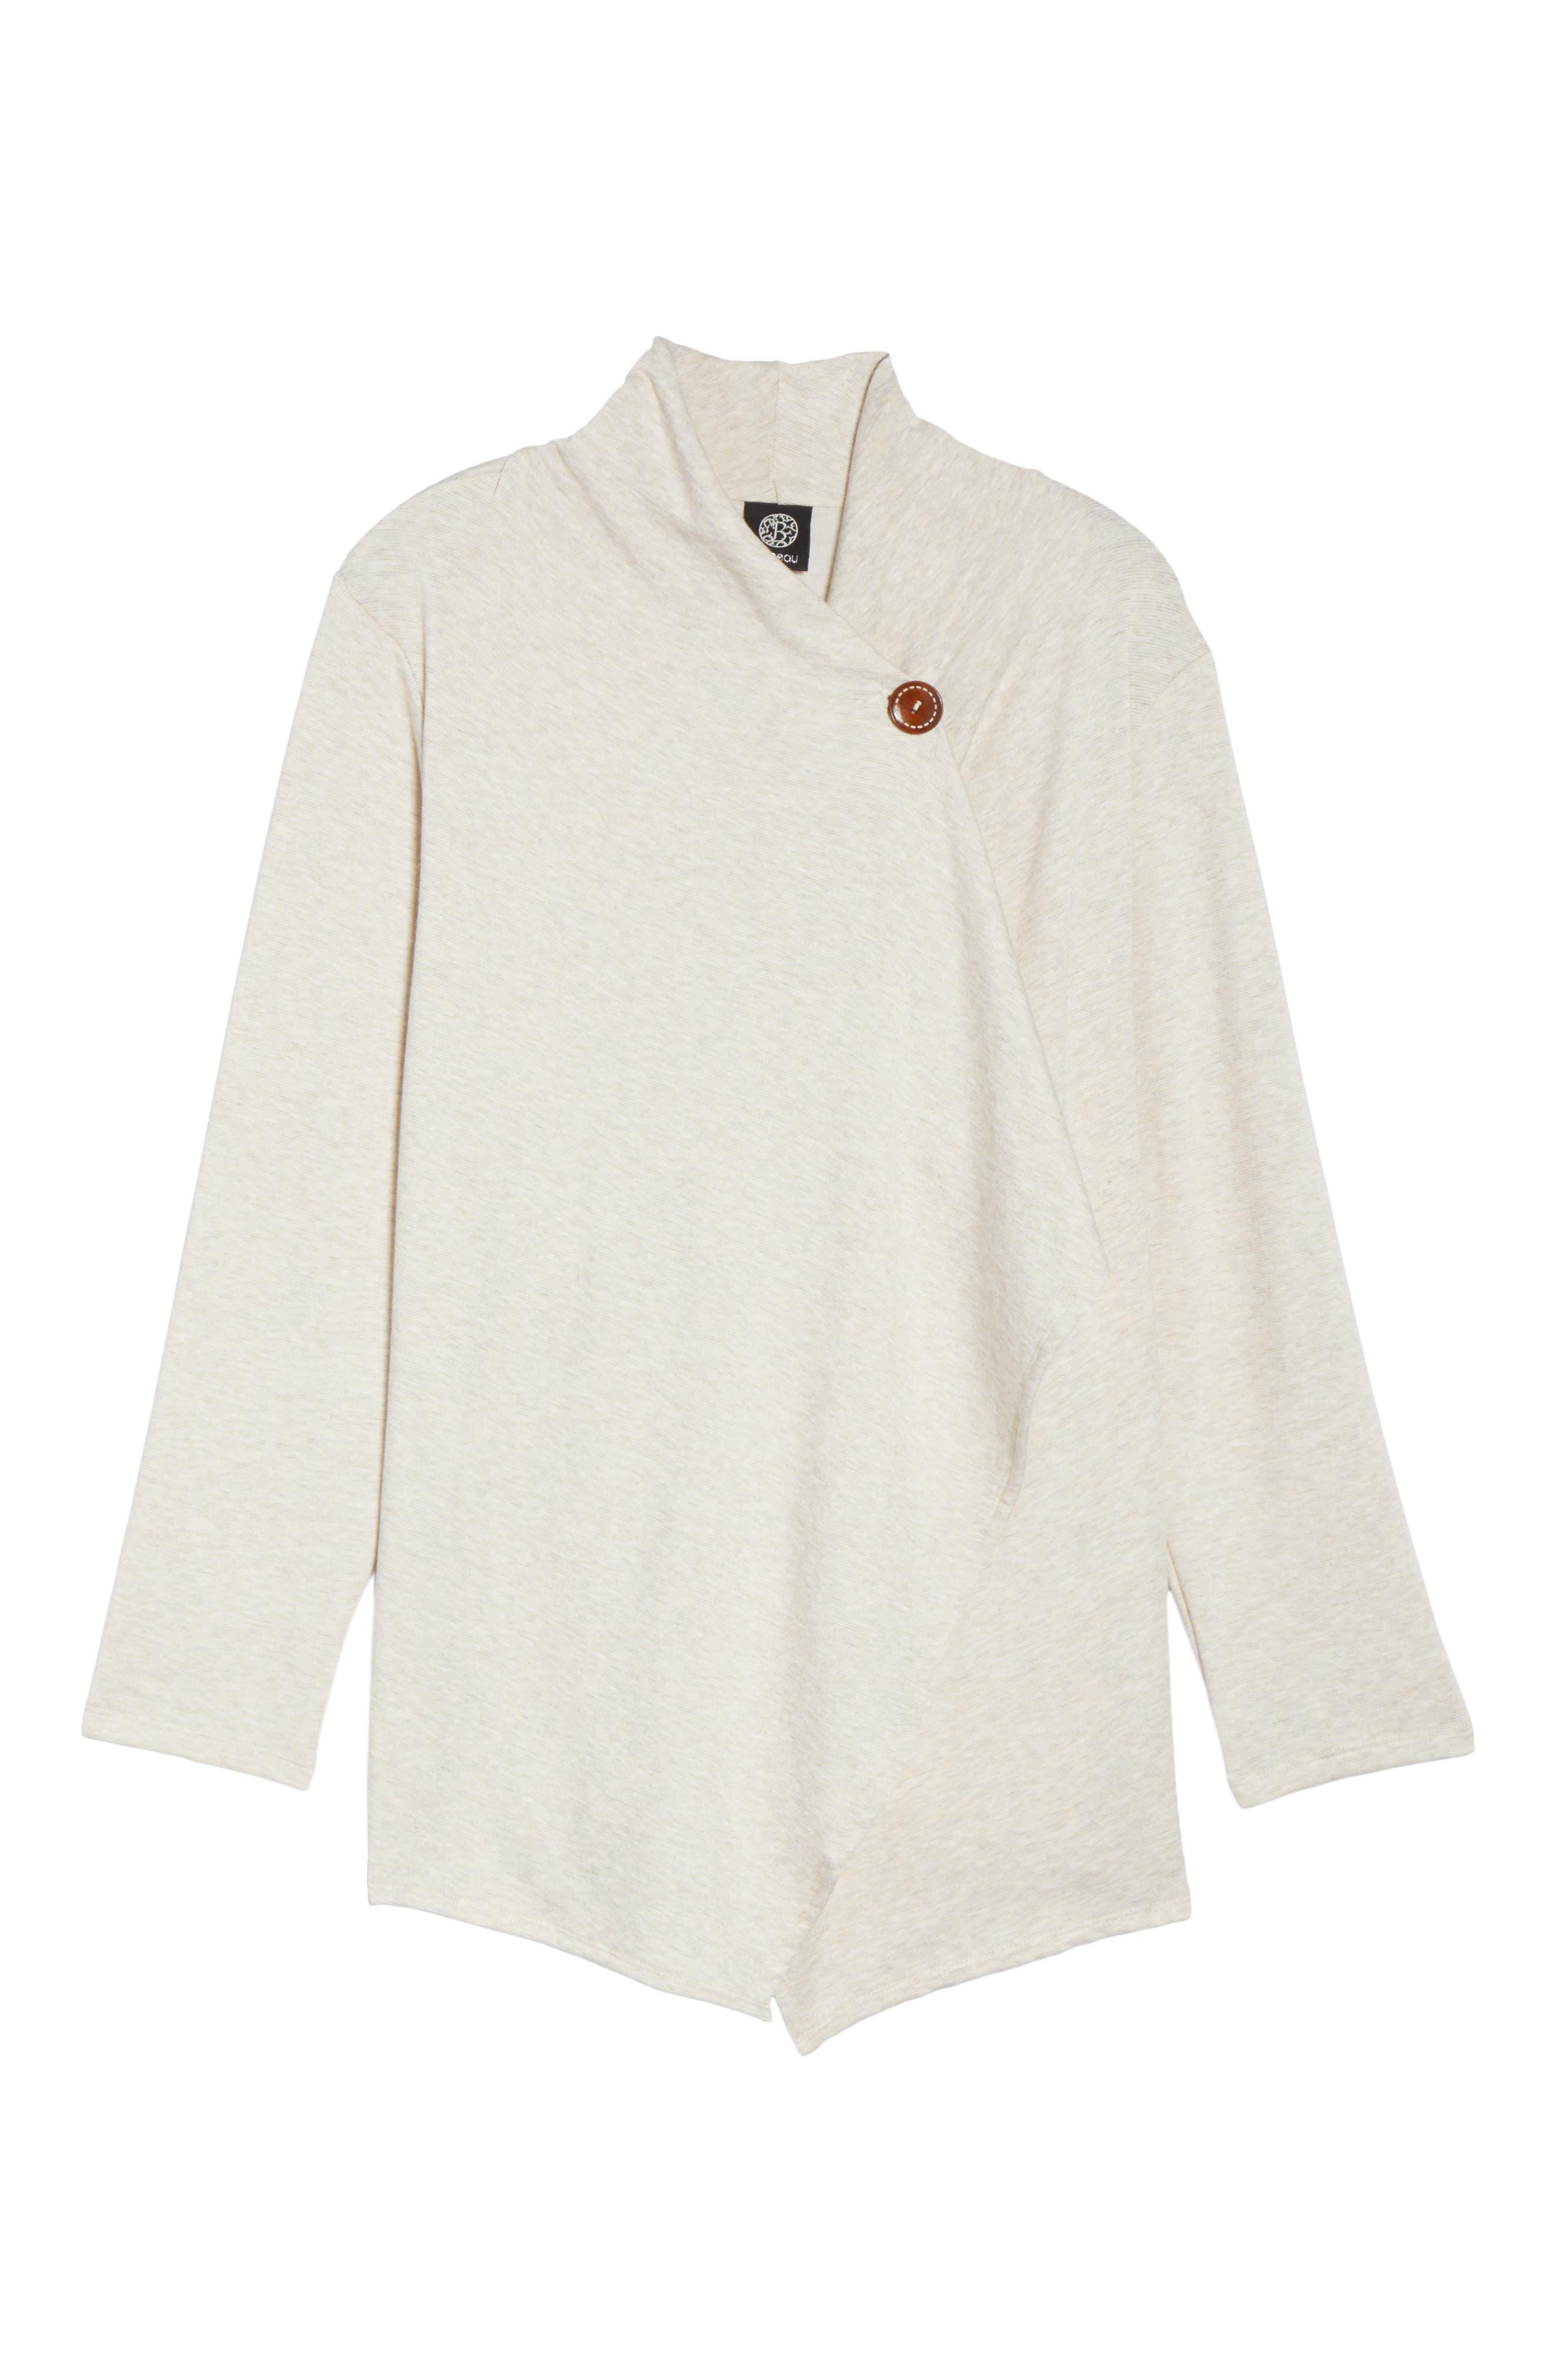 One-Button Fleece Cardigan,                             Alternate thumbnail 197, color,